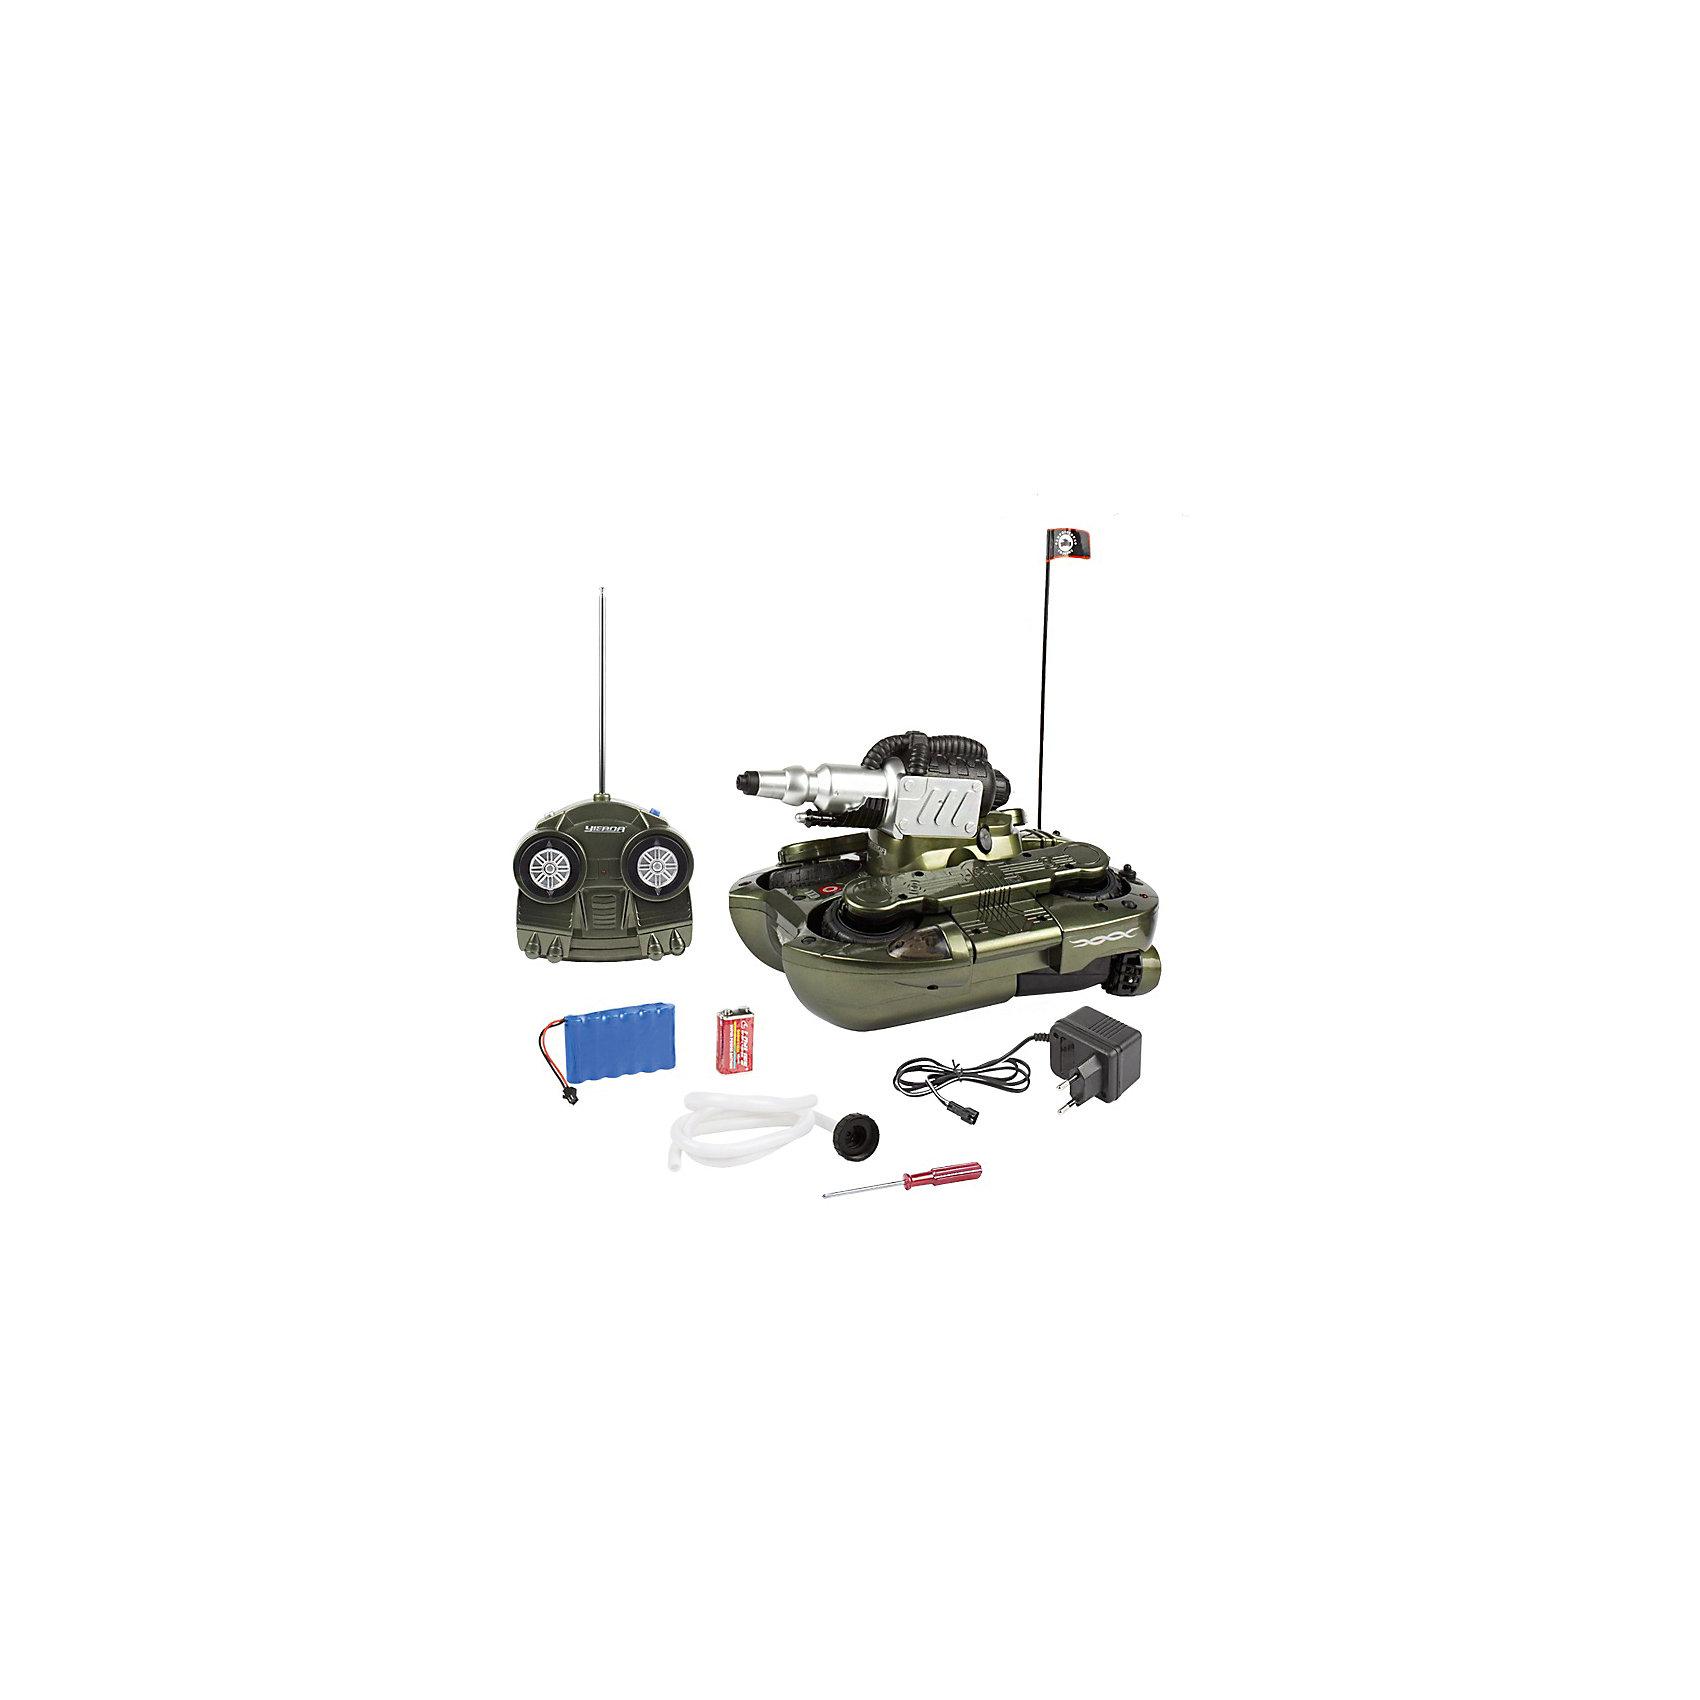 Mioshi Танк-амфибия Гидра-24, со светом, на радиоуправлении, Mioshi Army